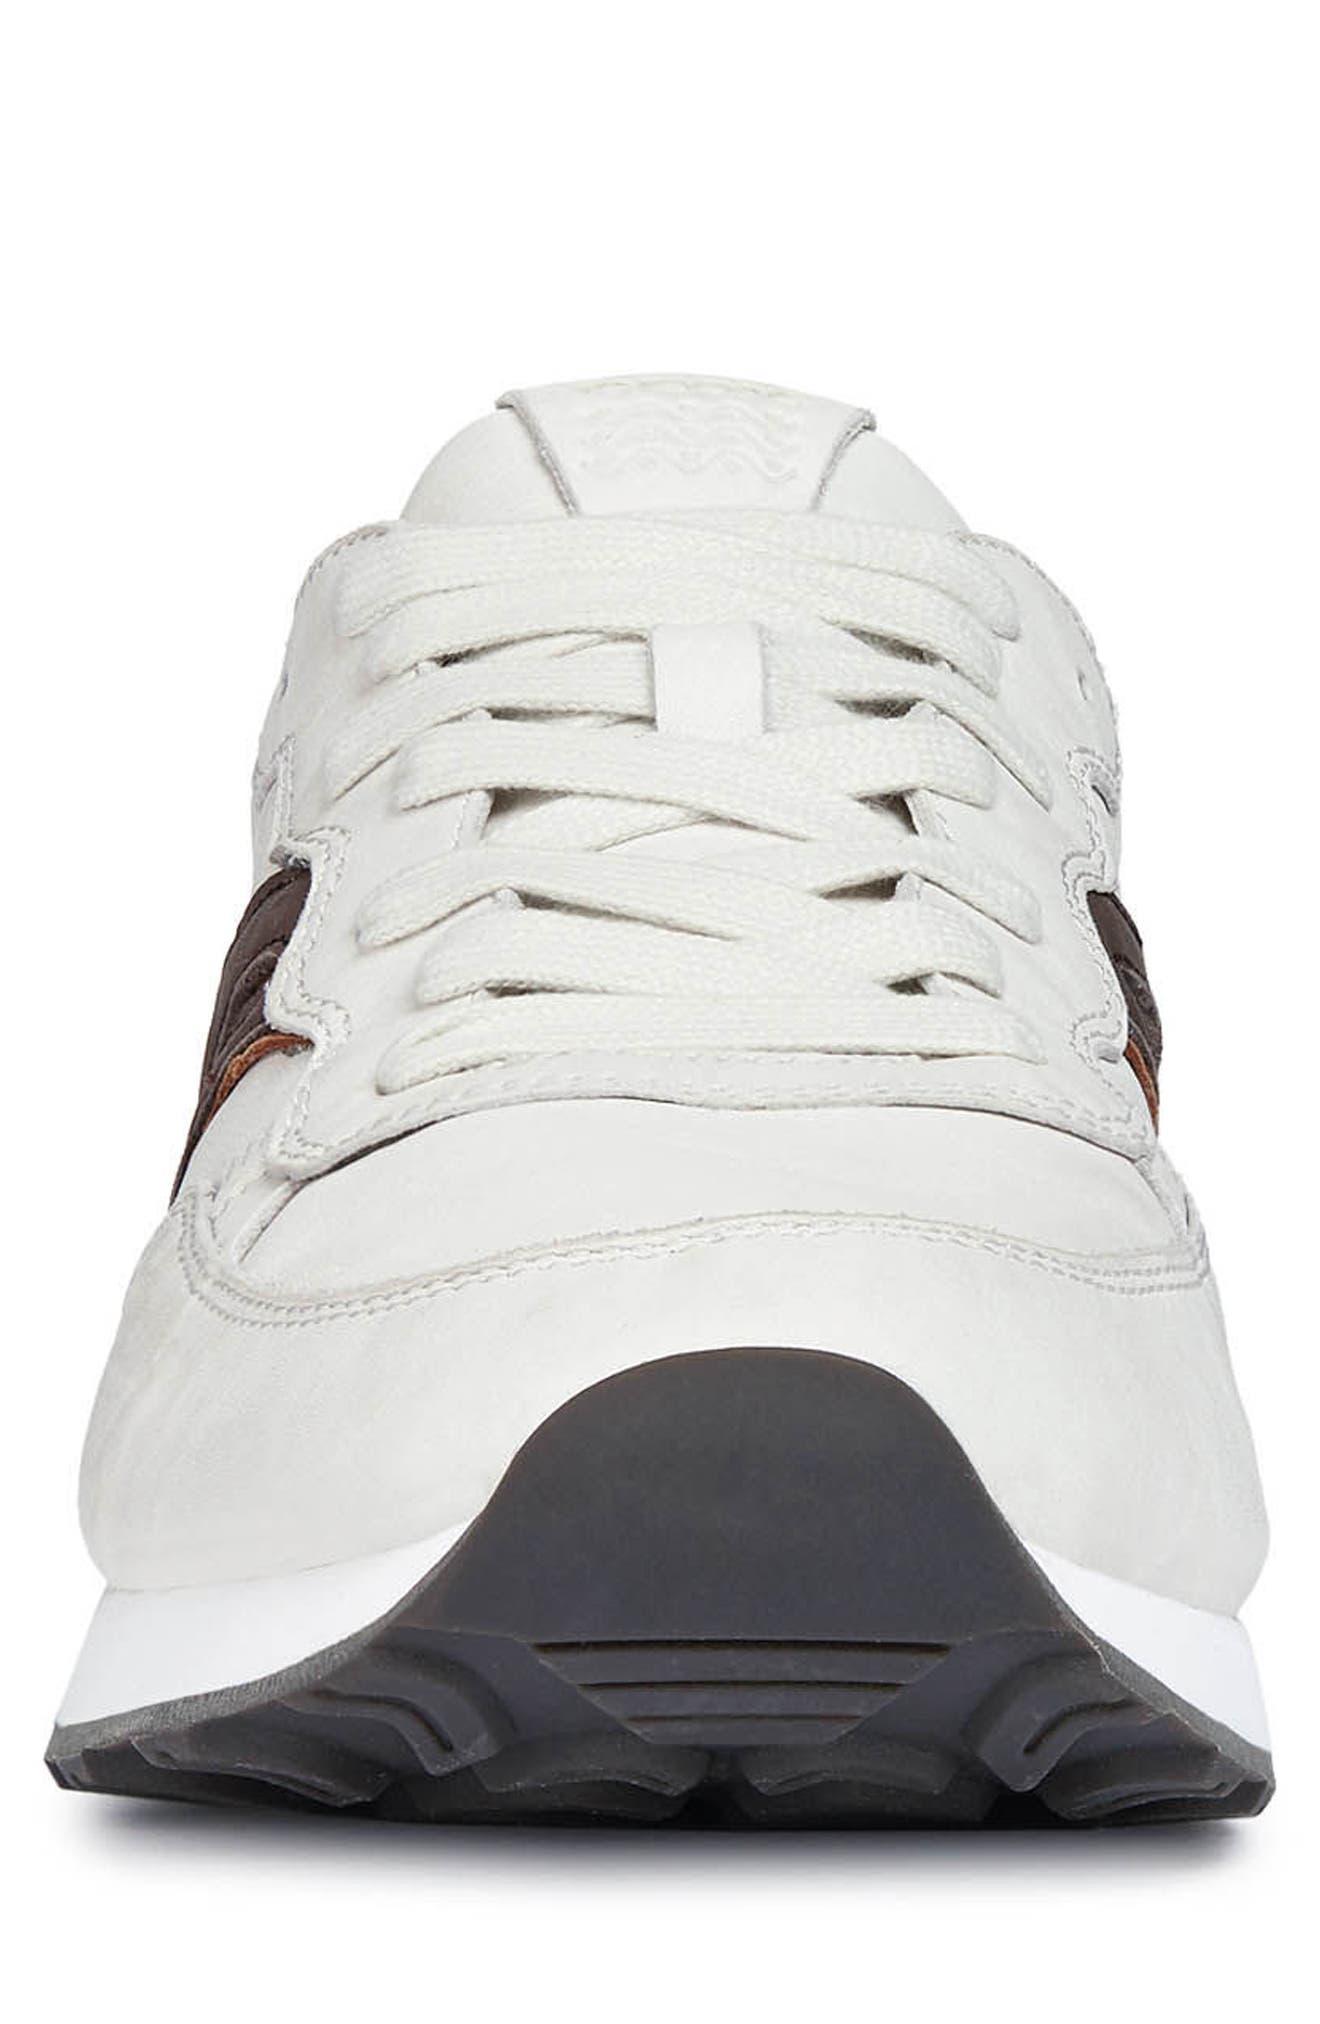 Vincint 1 Sneaker,                             Alternate thumbnail 4, color,                             WHITE/ DARK COFFEE LEATHER